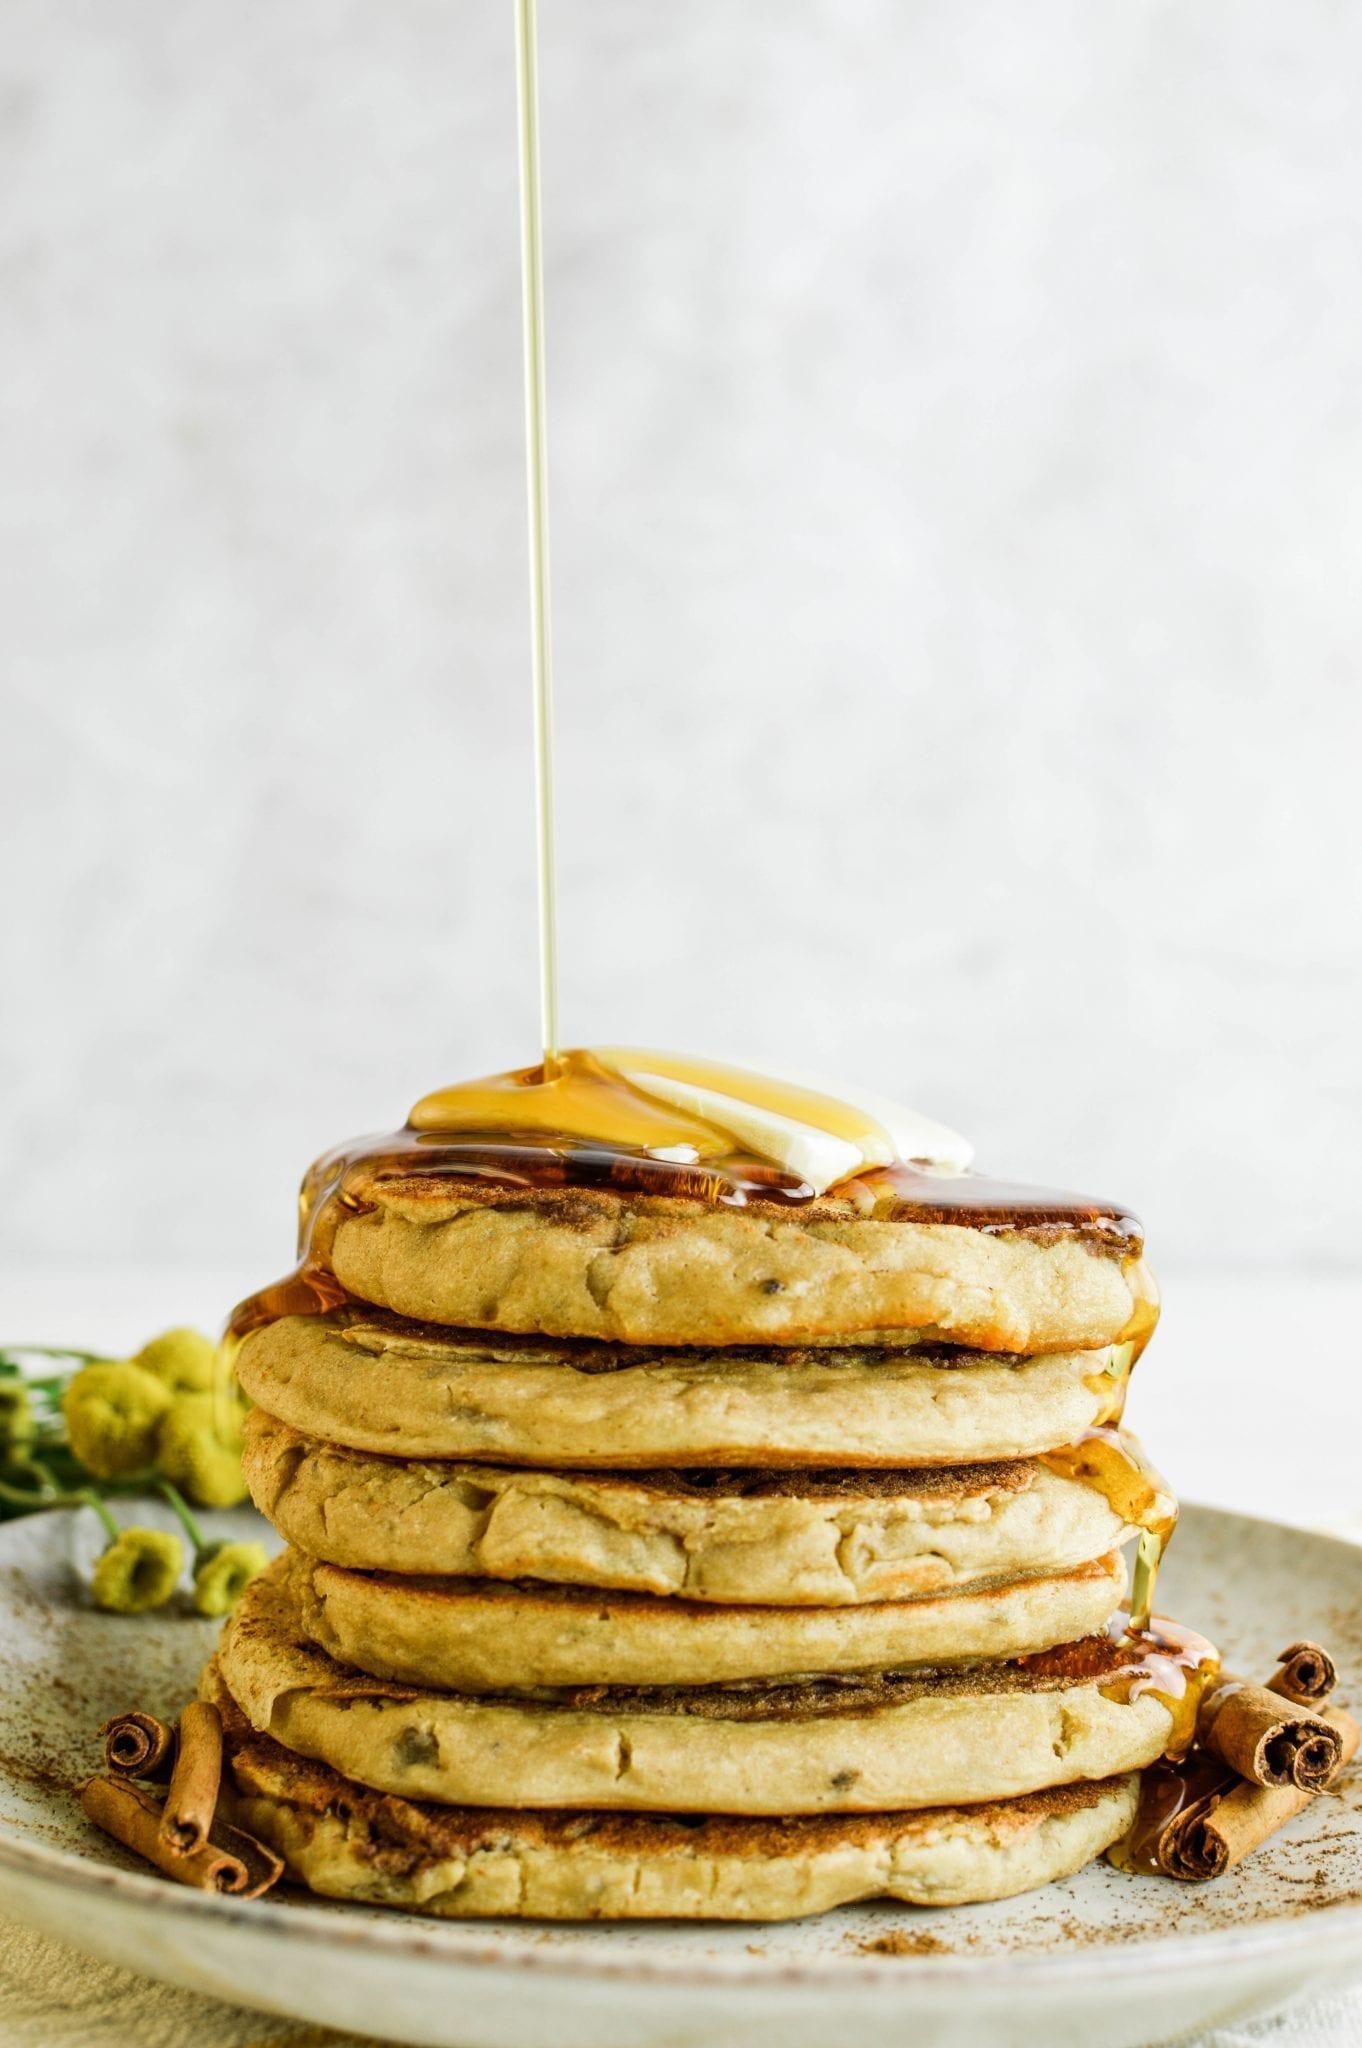 Sweet and Delicious Cinnamon Swirl Protein Pancakes   Vegan   Dairy-Free